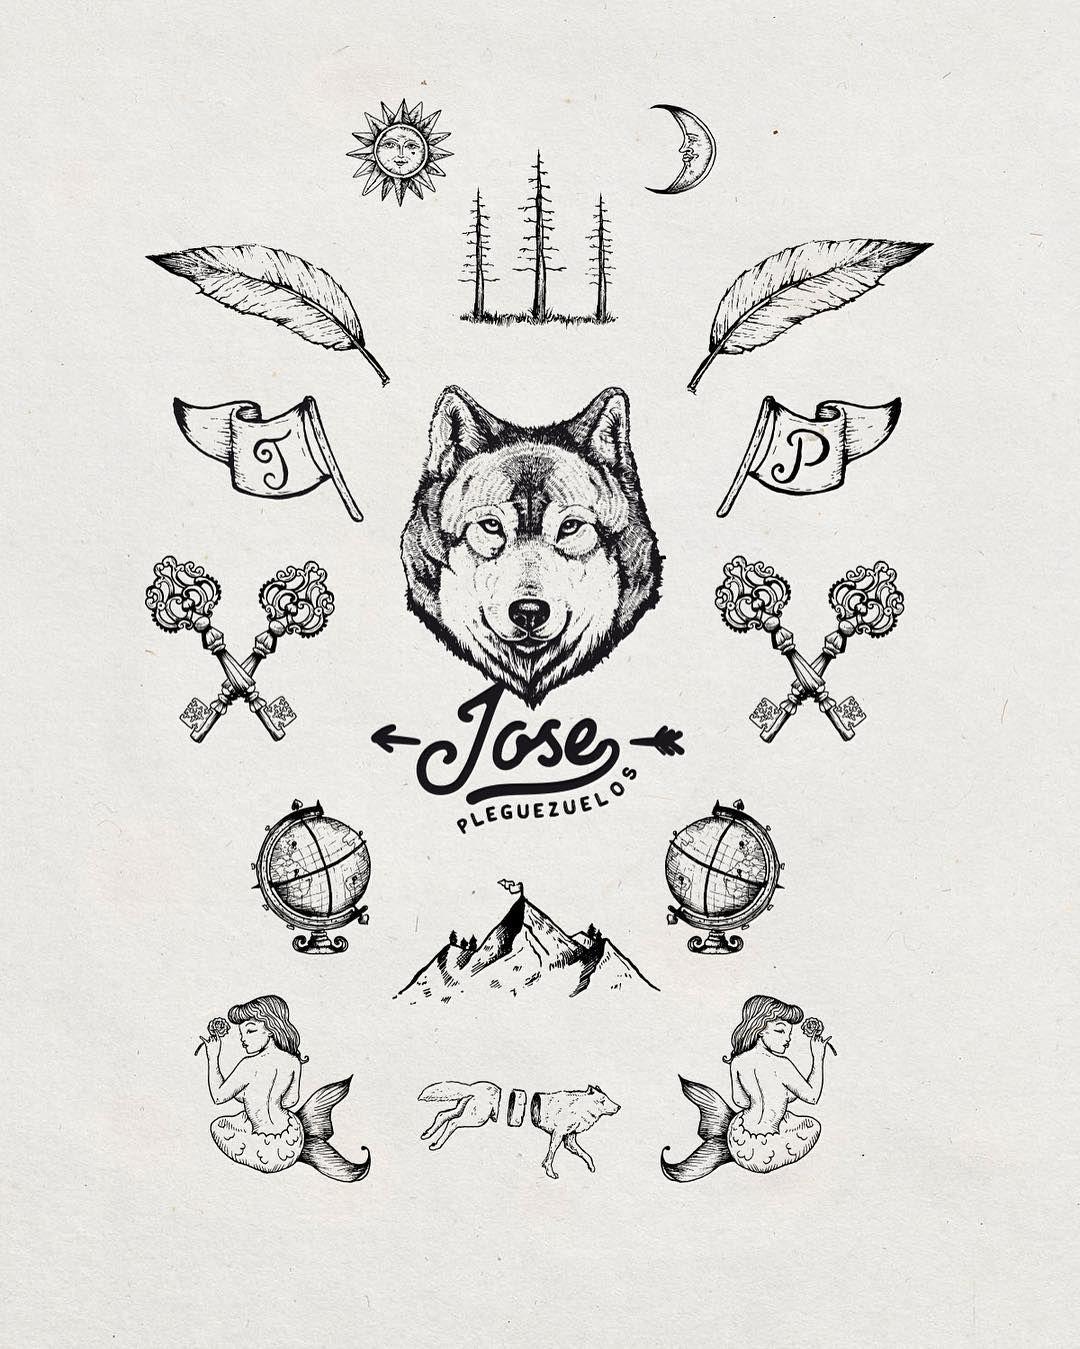 Jose pleguezuelos branding branding logo handdrawn icons wolf